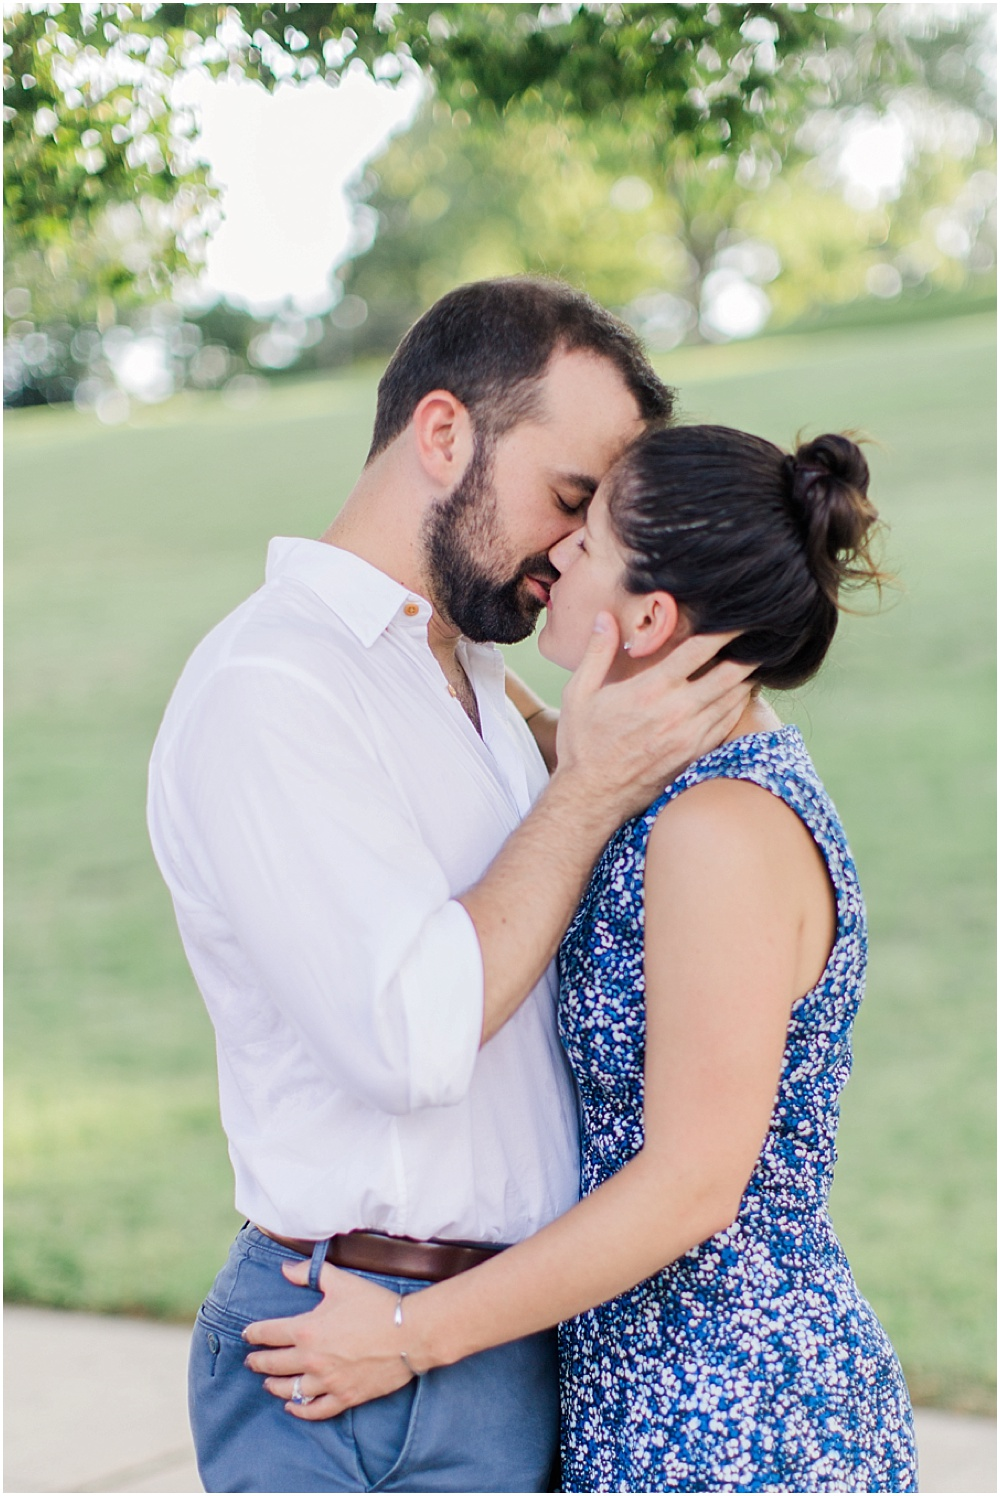 Liz_Robert_Federal_Hill_Engagement_Session_Baltimore_Wedding_Photographer_0018